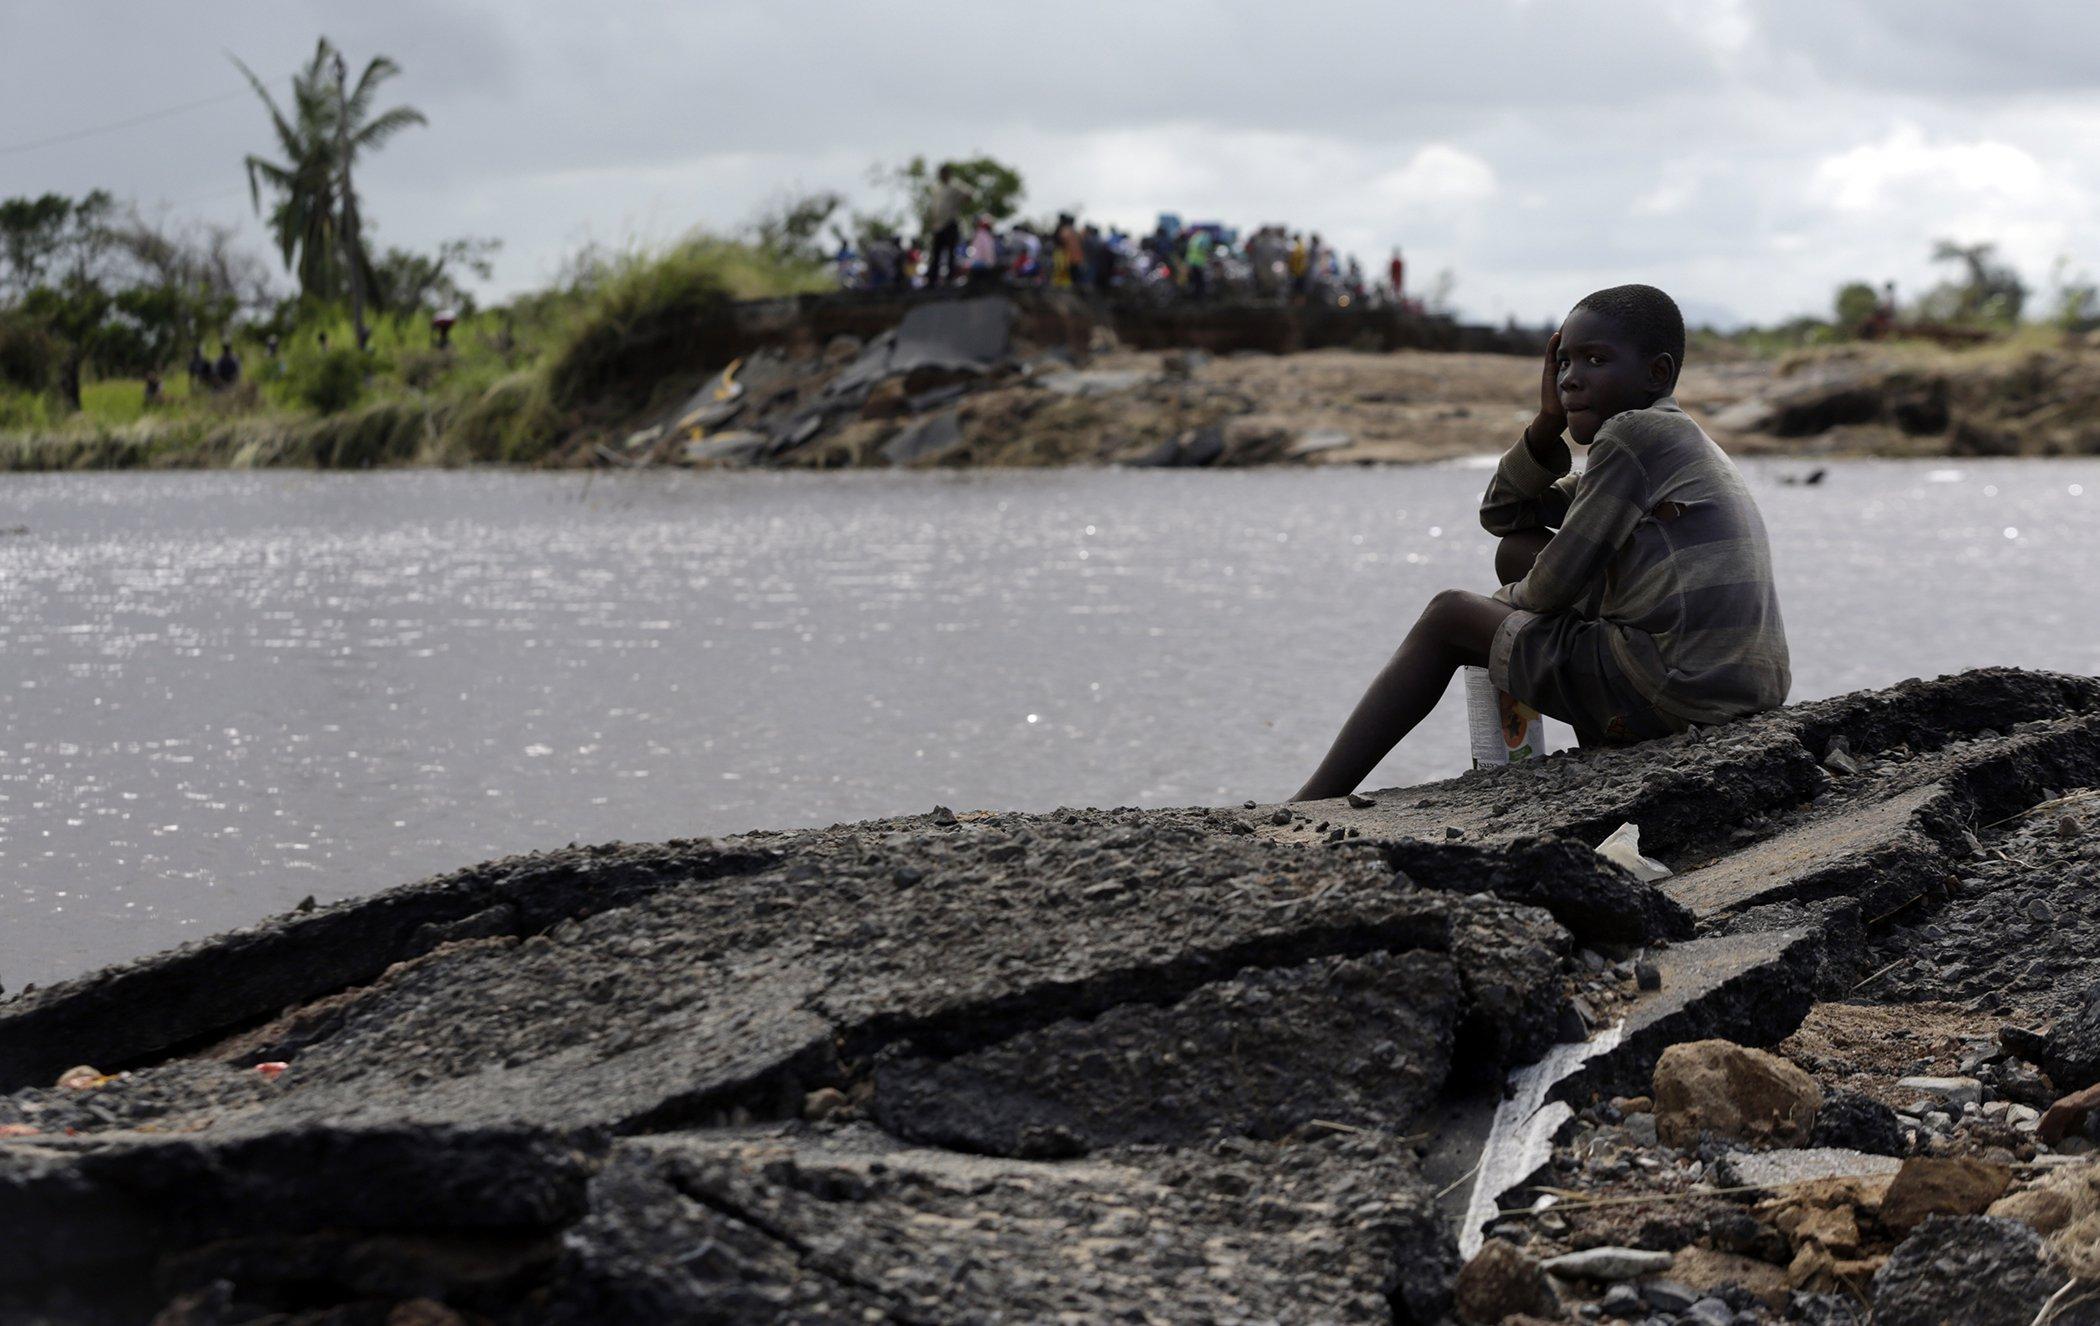 Cyclone-Zimbabwe-Mozambique-Relief-Efforts-Red-Cross.jpg